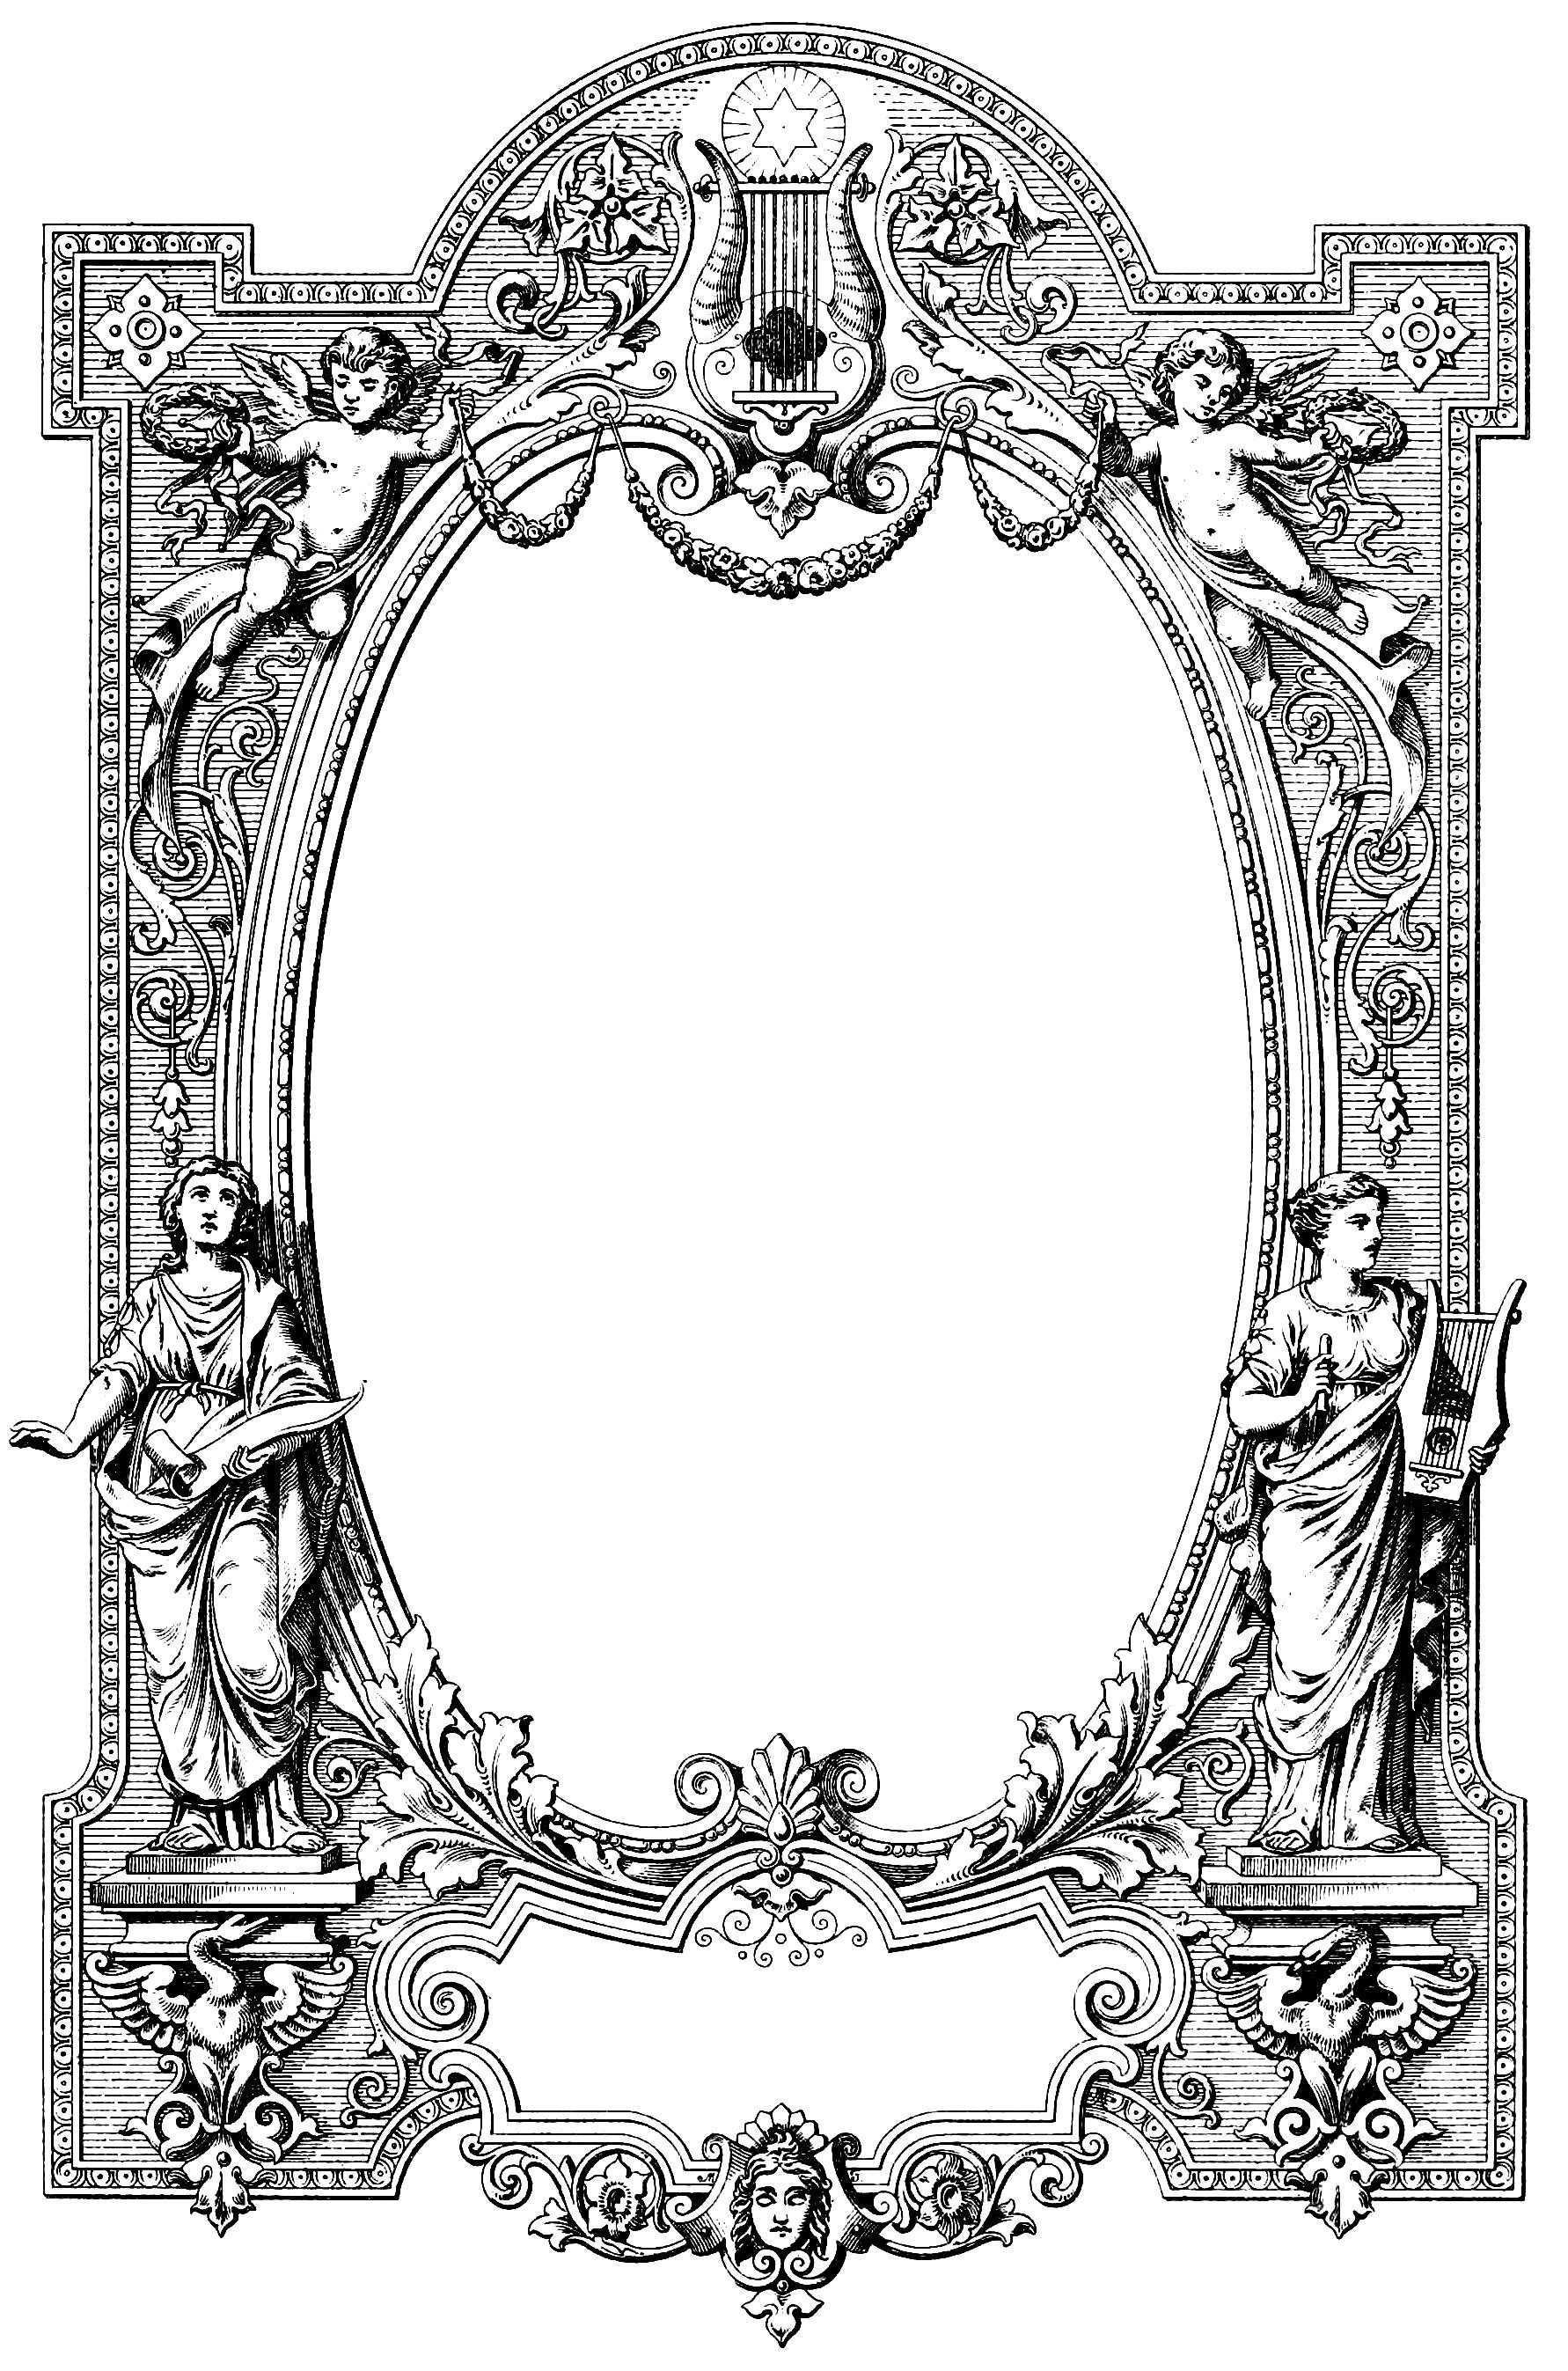 Vgosn Vintage Clip Art Border Illustration Jpg Jpeg Image 1782 2694 Pixels Scaled 25 Vintage Clipart Strichzeichnung Linienzuge